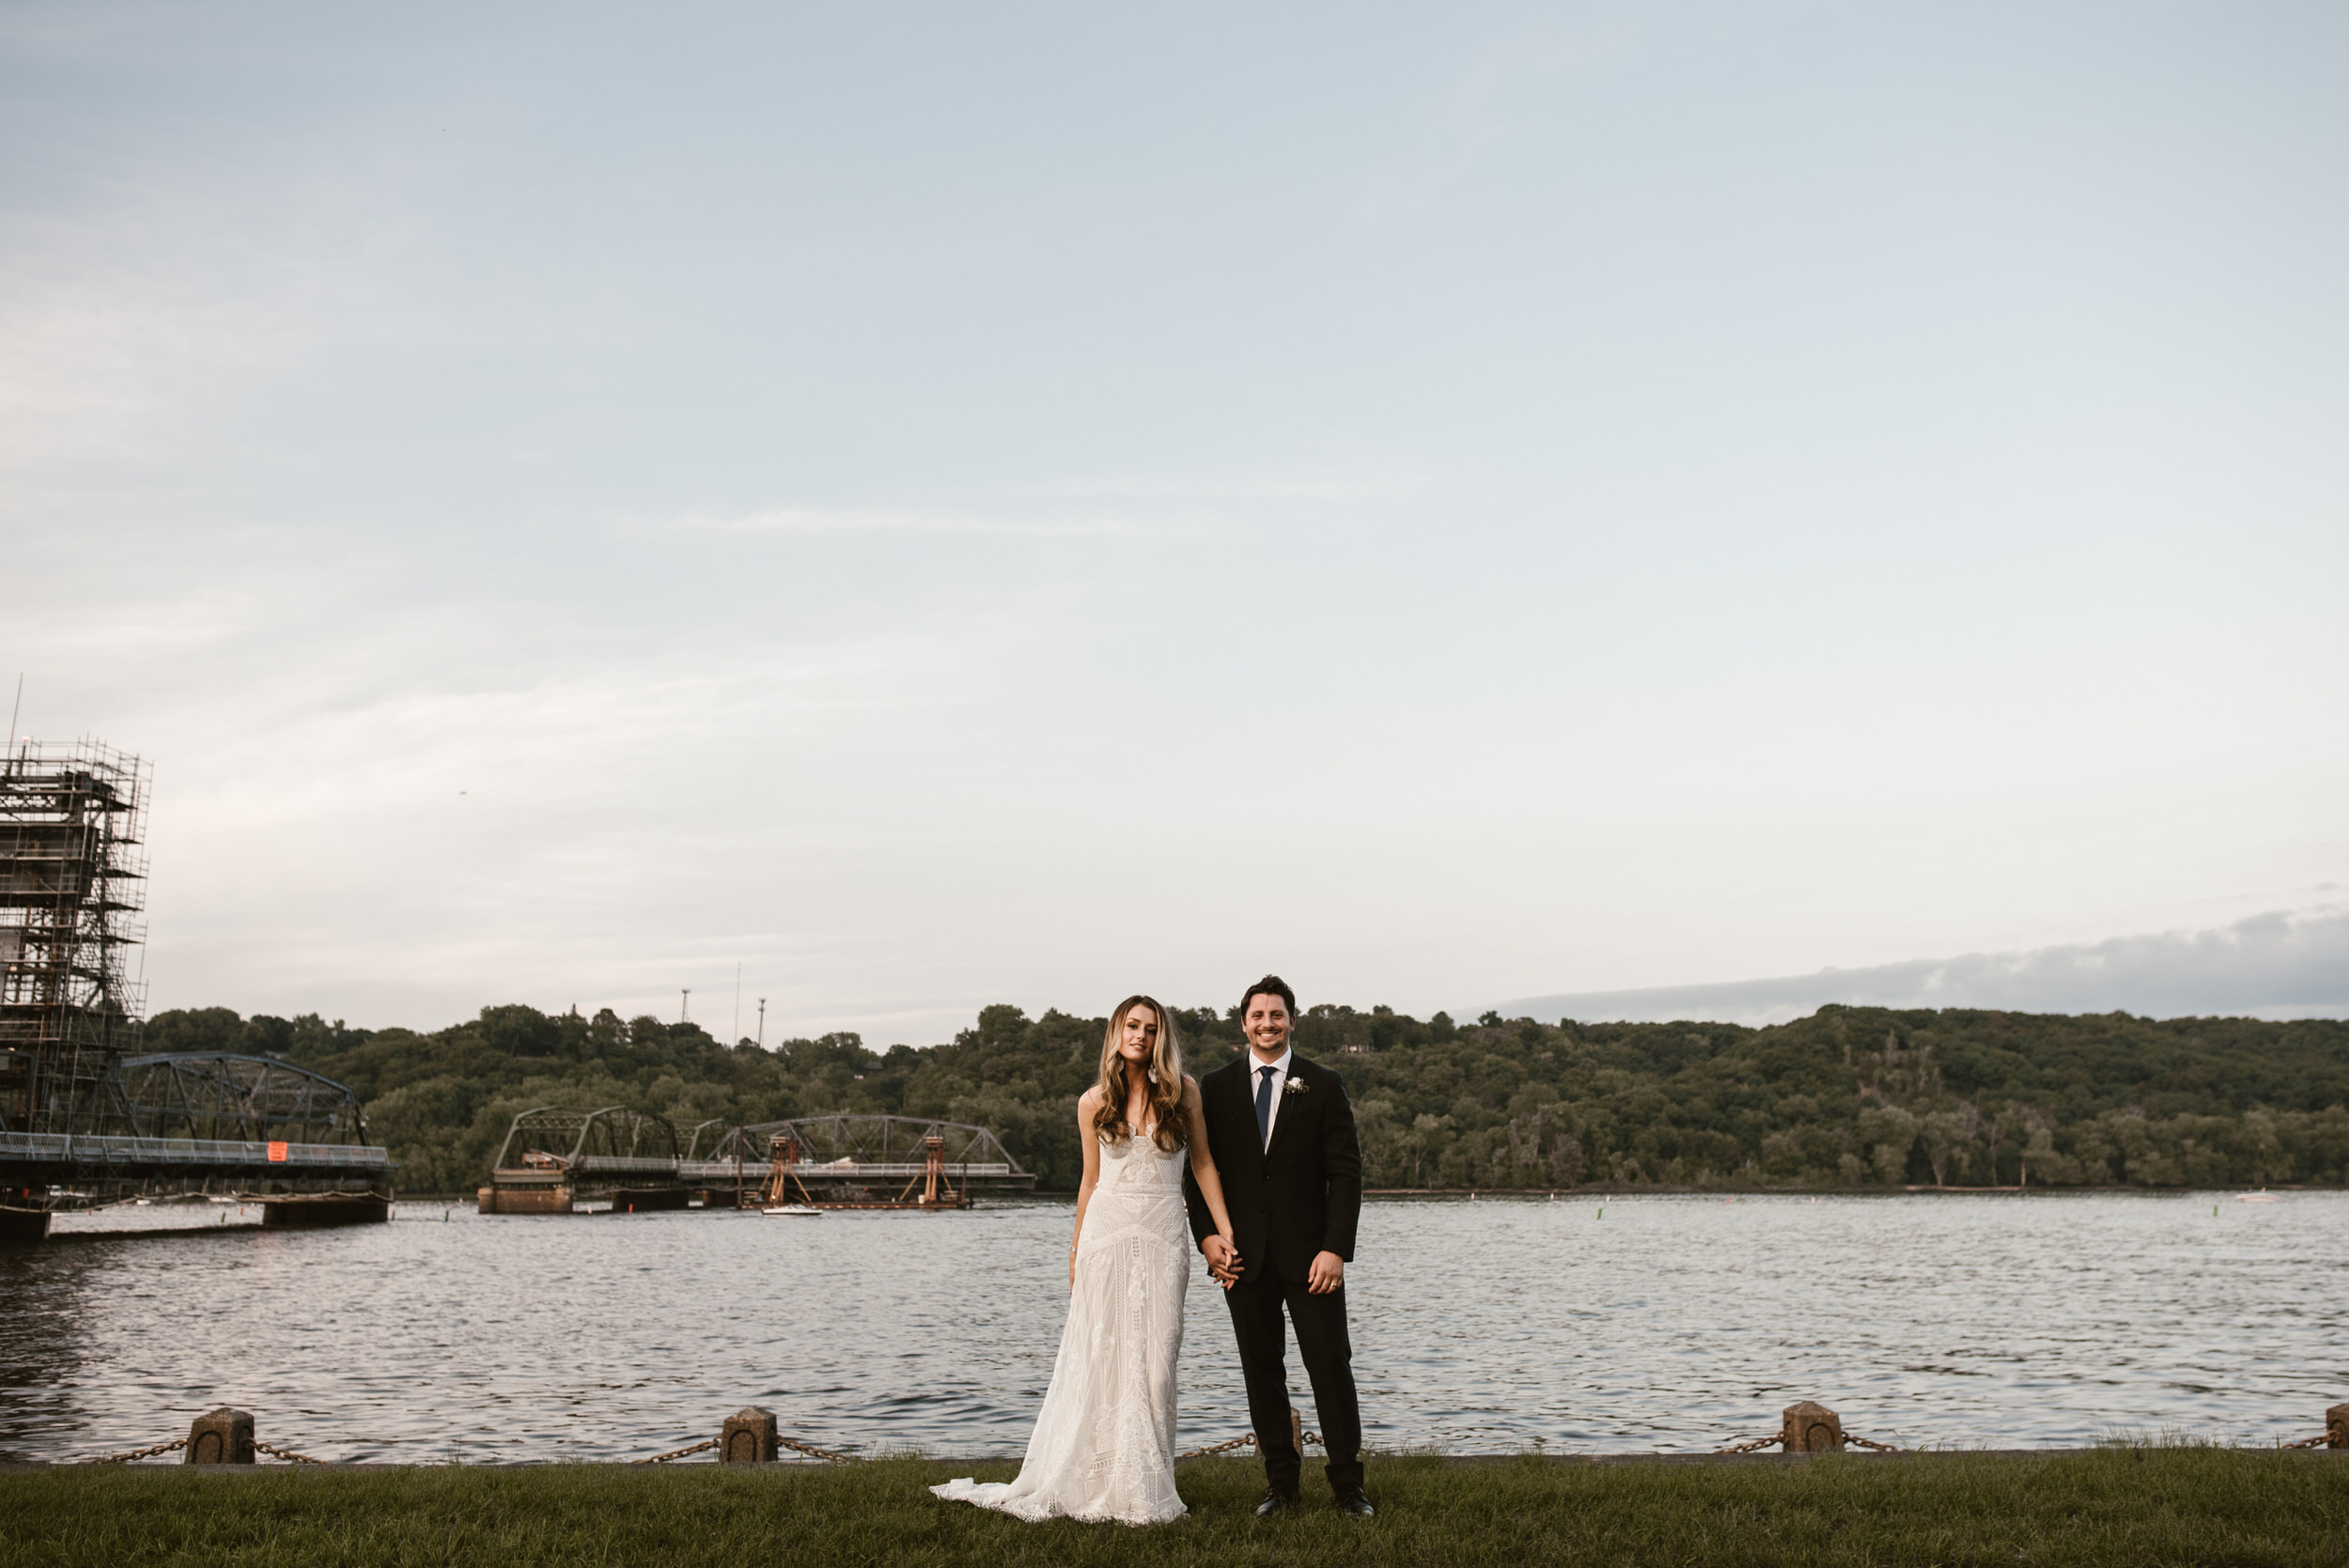 Stillwater-Minnesota-Wedding-Loft-at-Studio-J-Kaylie-Sirek-Photography-42.jpg